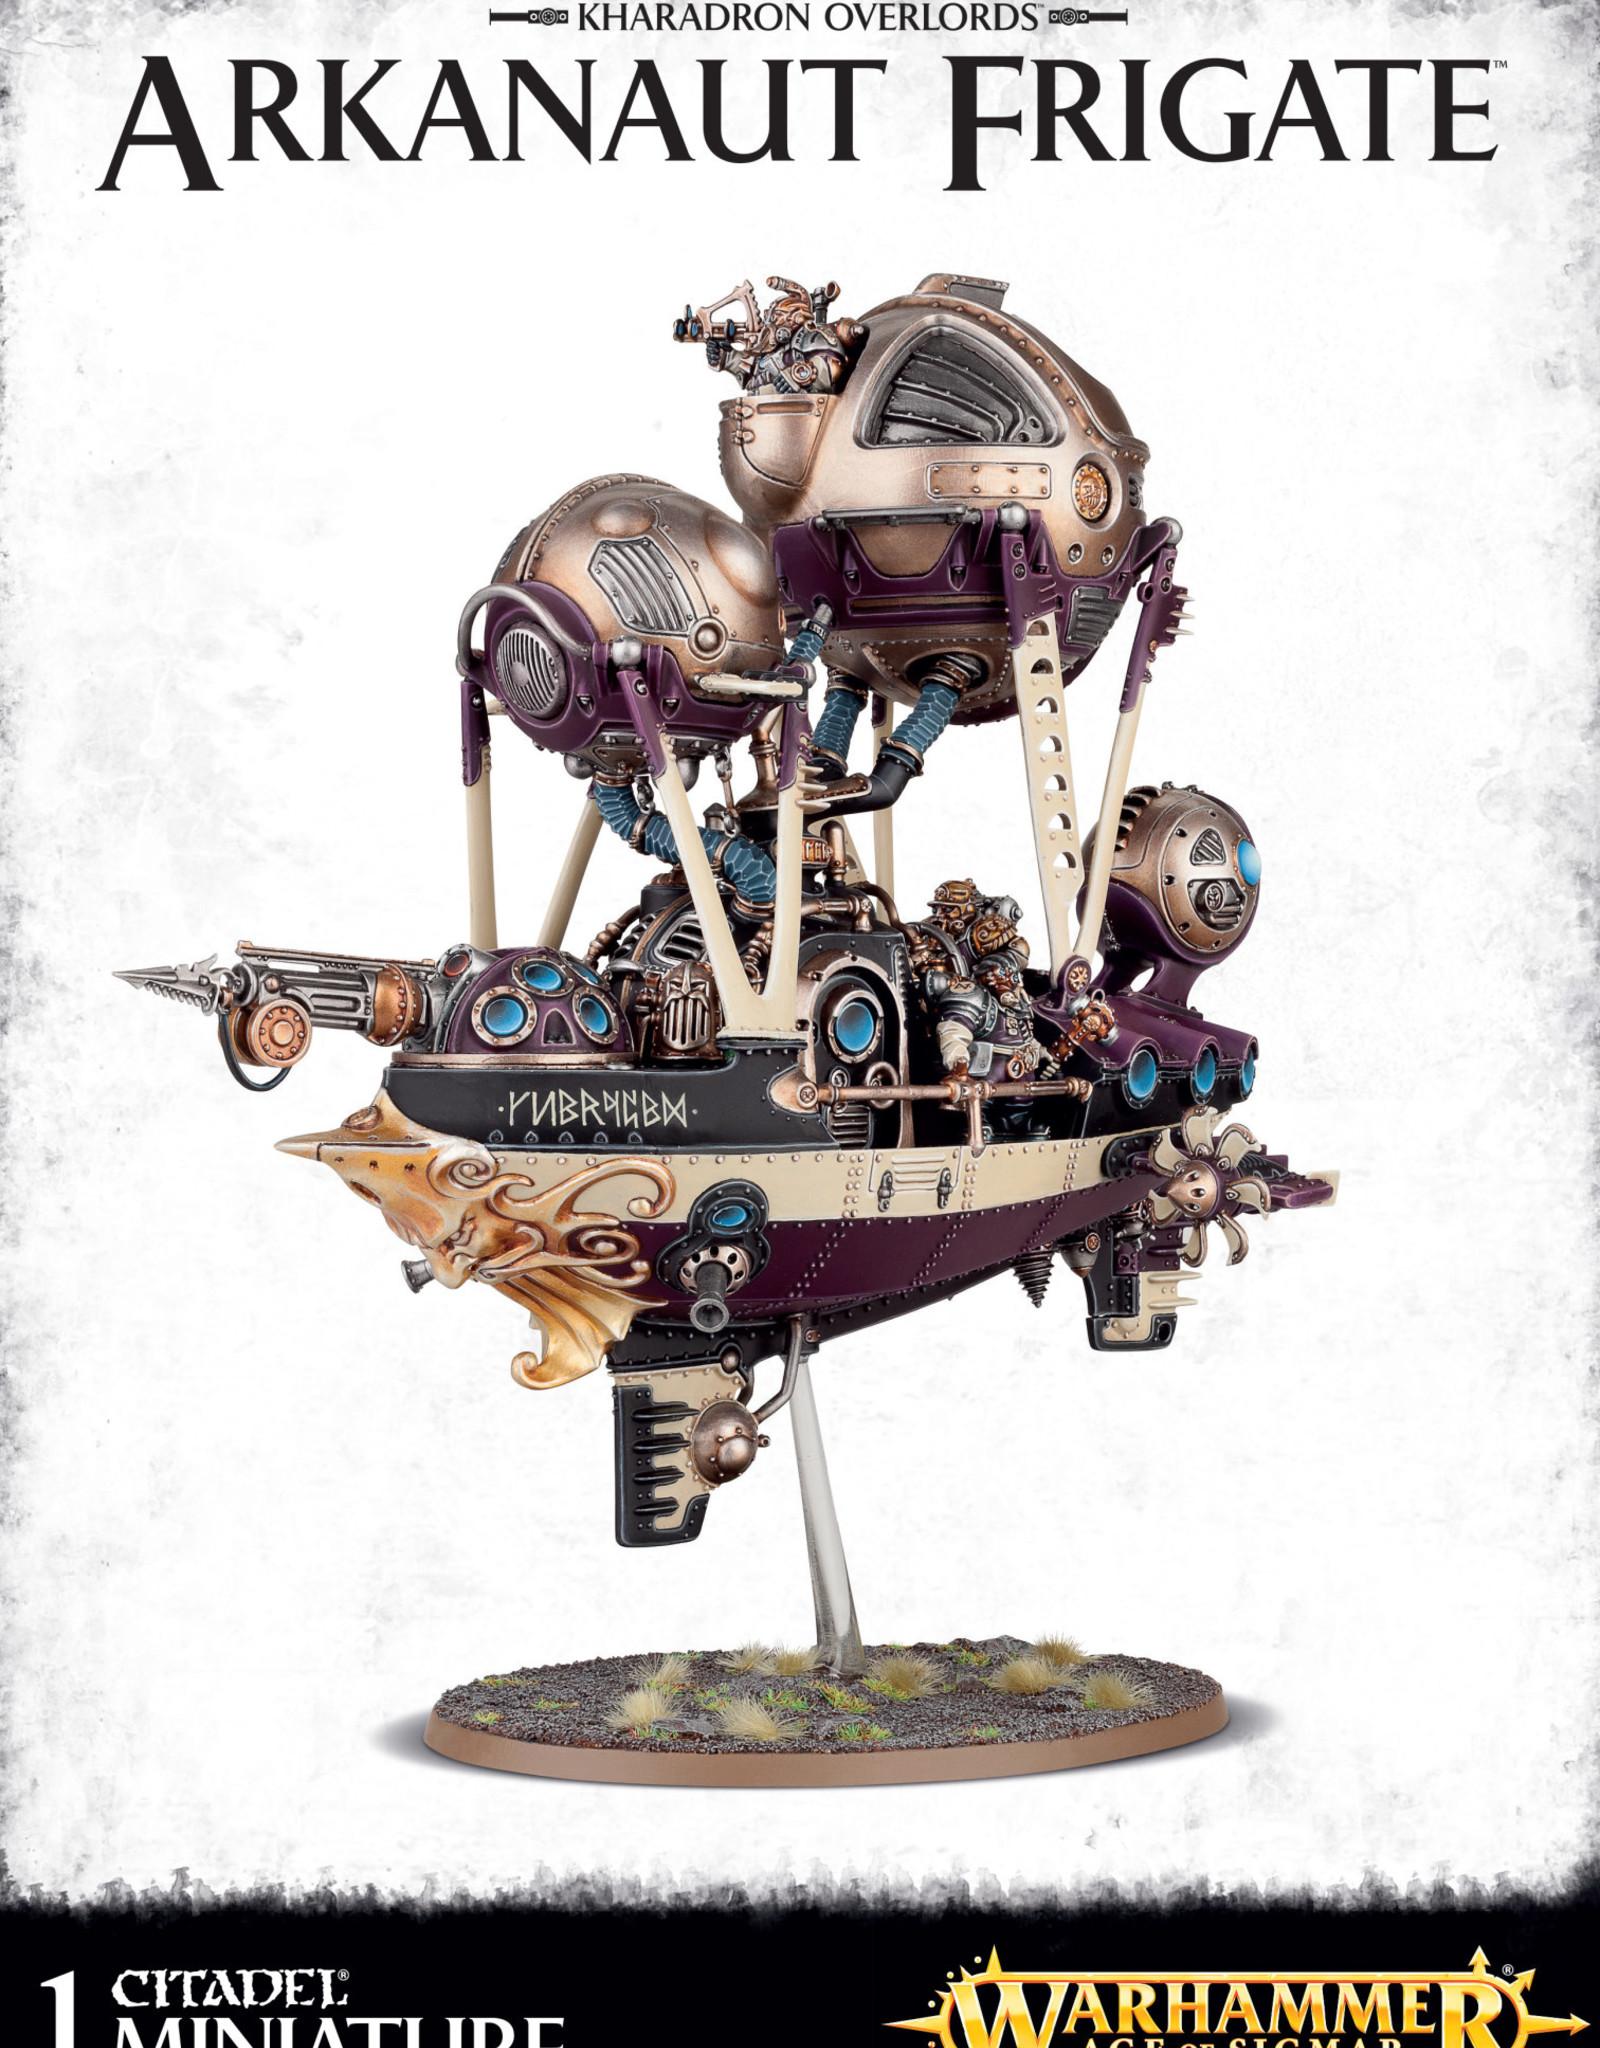 Age of Sigmar Kharadron Overlords Arkanaut Frigate